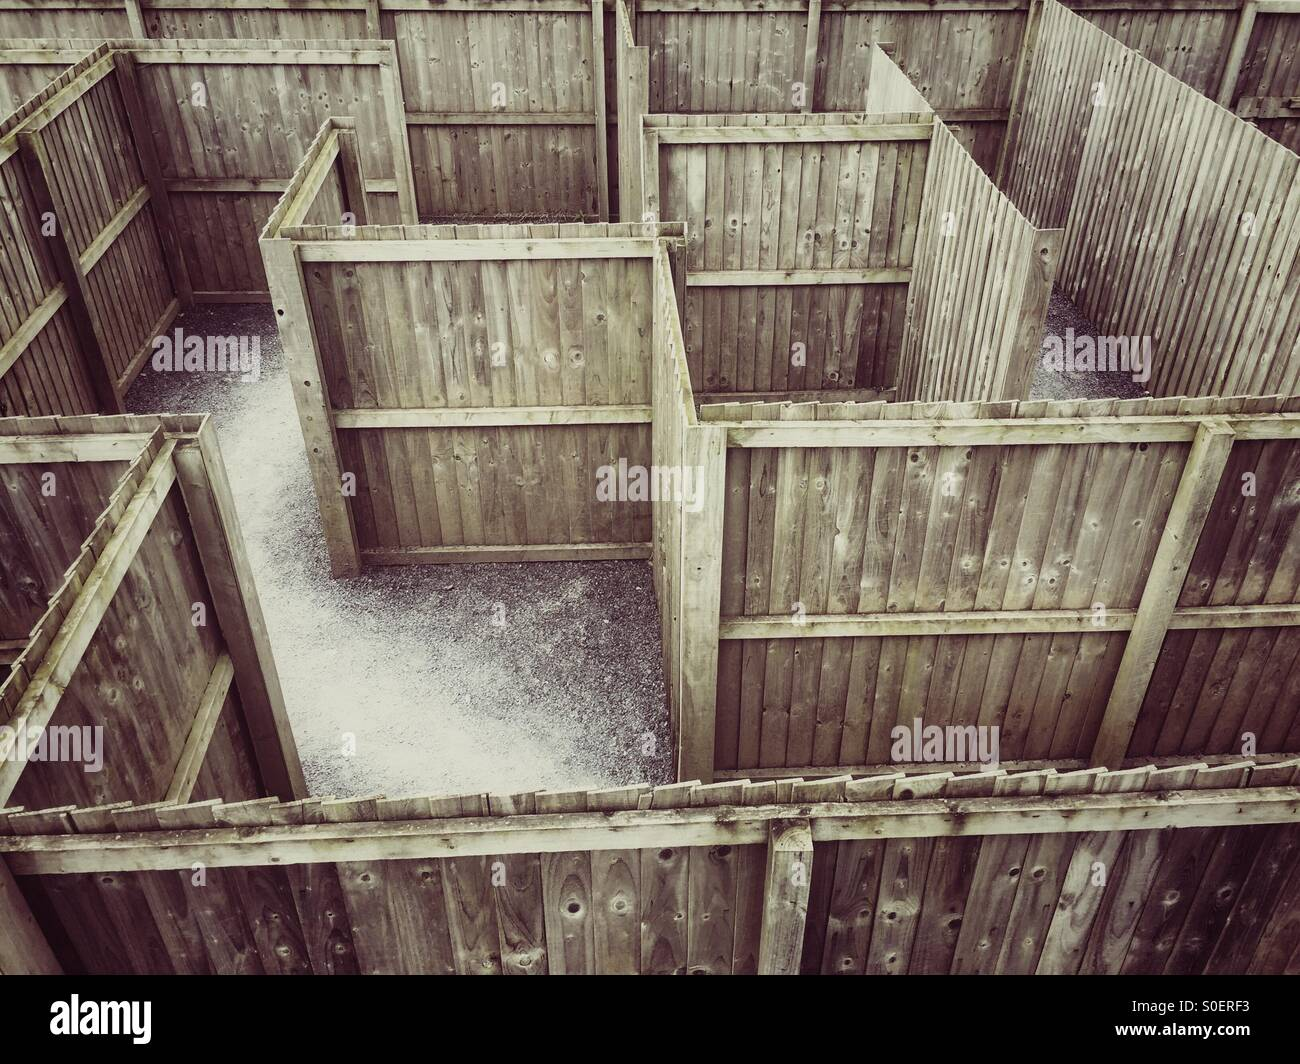 Laberinto de madera Imagen De Stock